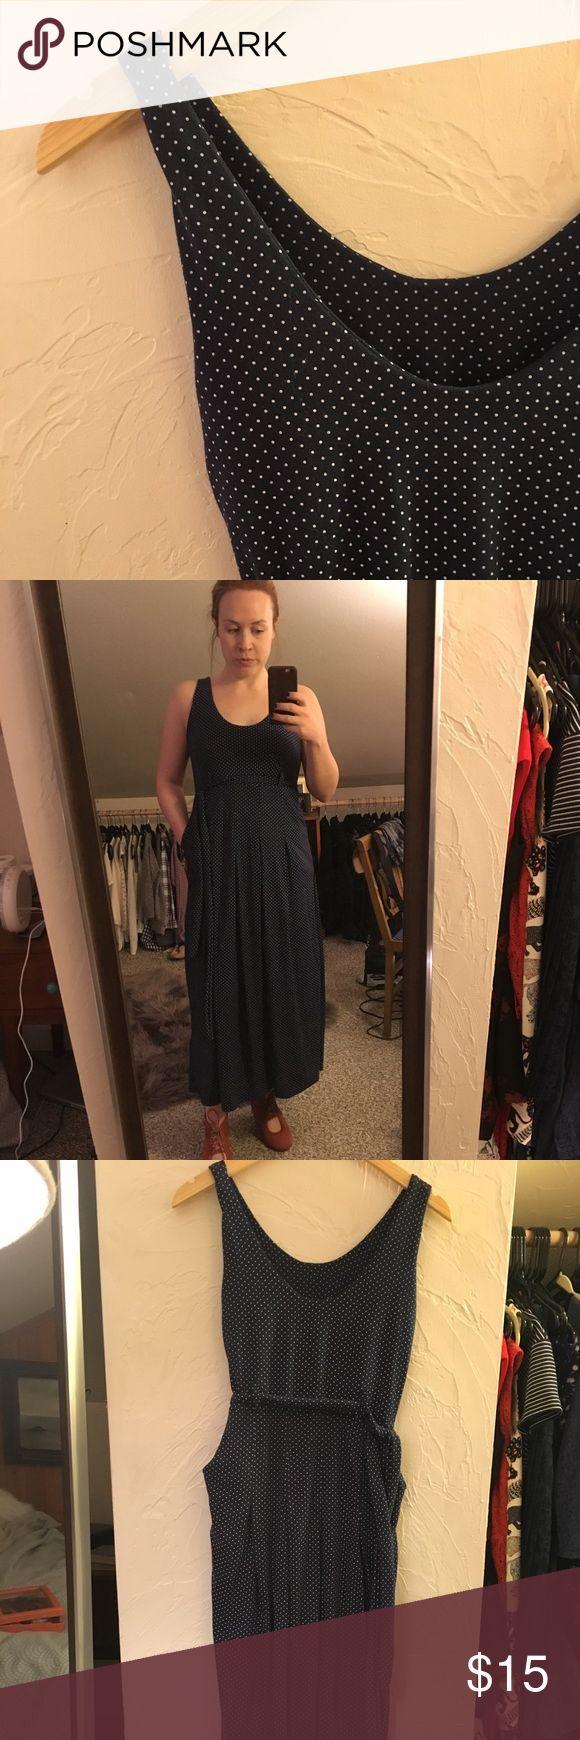 Polka dot European brand maxi dress. Soft comfortable polka dot maxi dress with pockets. Could be worn as a comfy day dress or beach coverup. Dresses Maxi